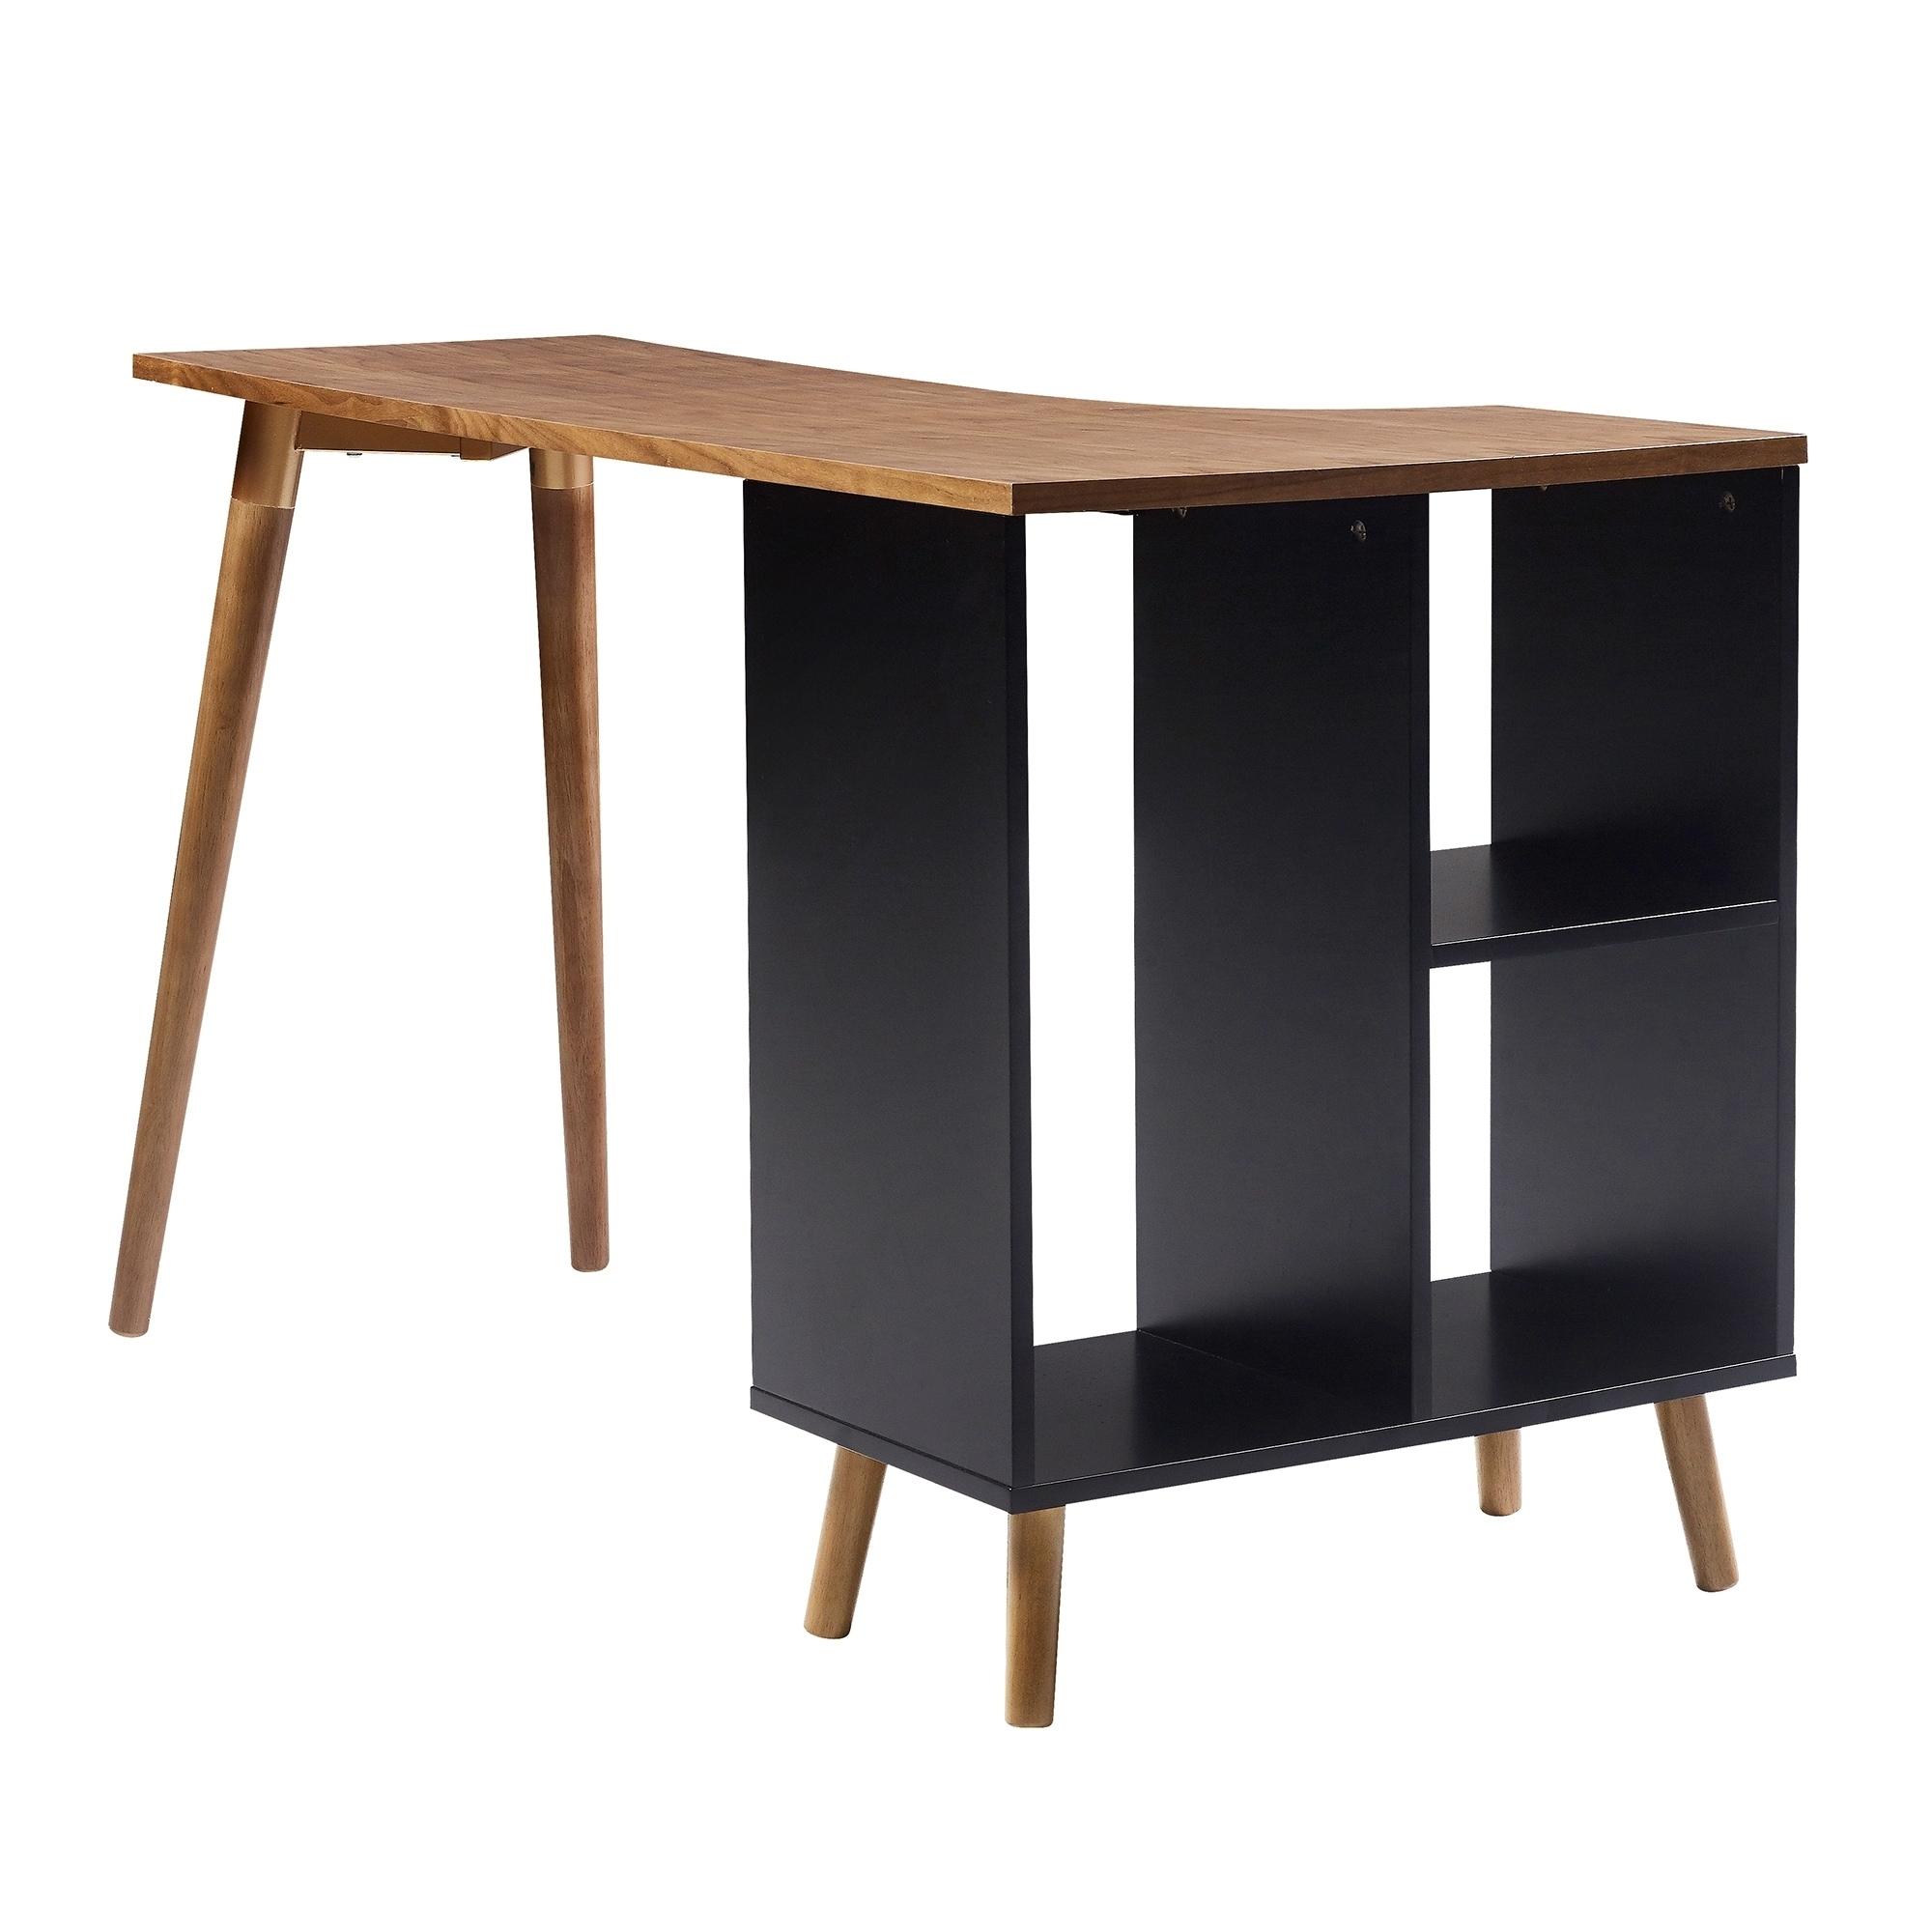 office desk walnut. Shop Versanora - Bloccare Office Desk Walnut/Black Free Shipping Today  Overstock.com 19626500 Office Desk Walnut